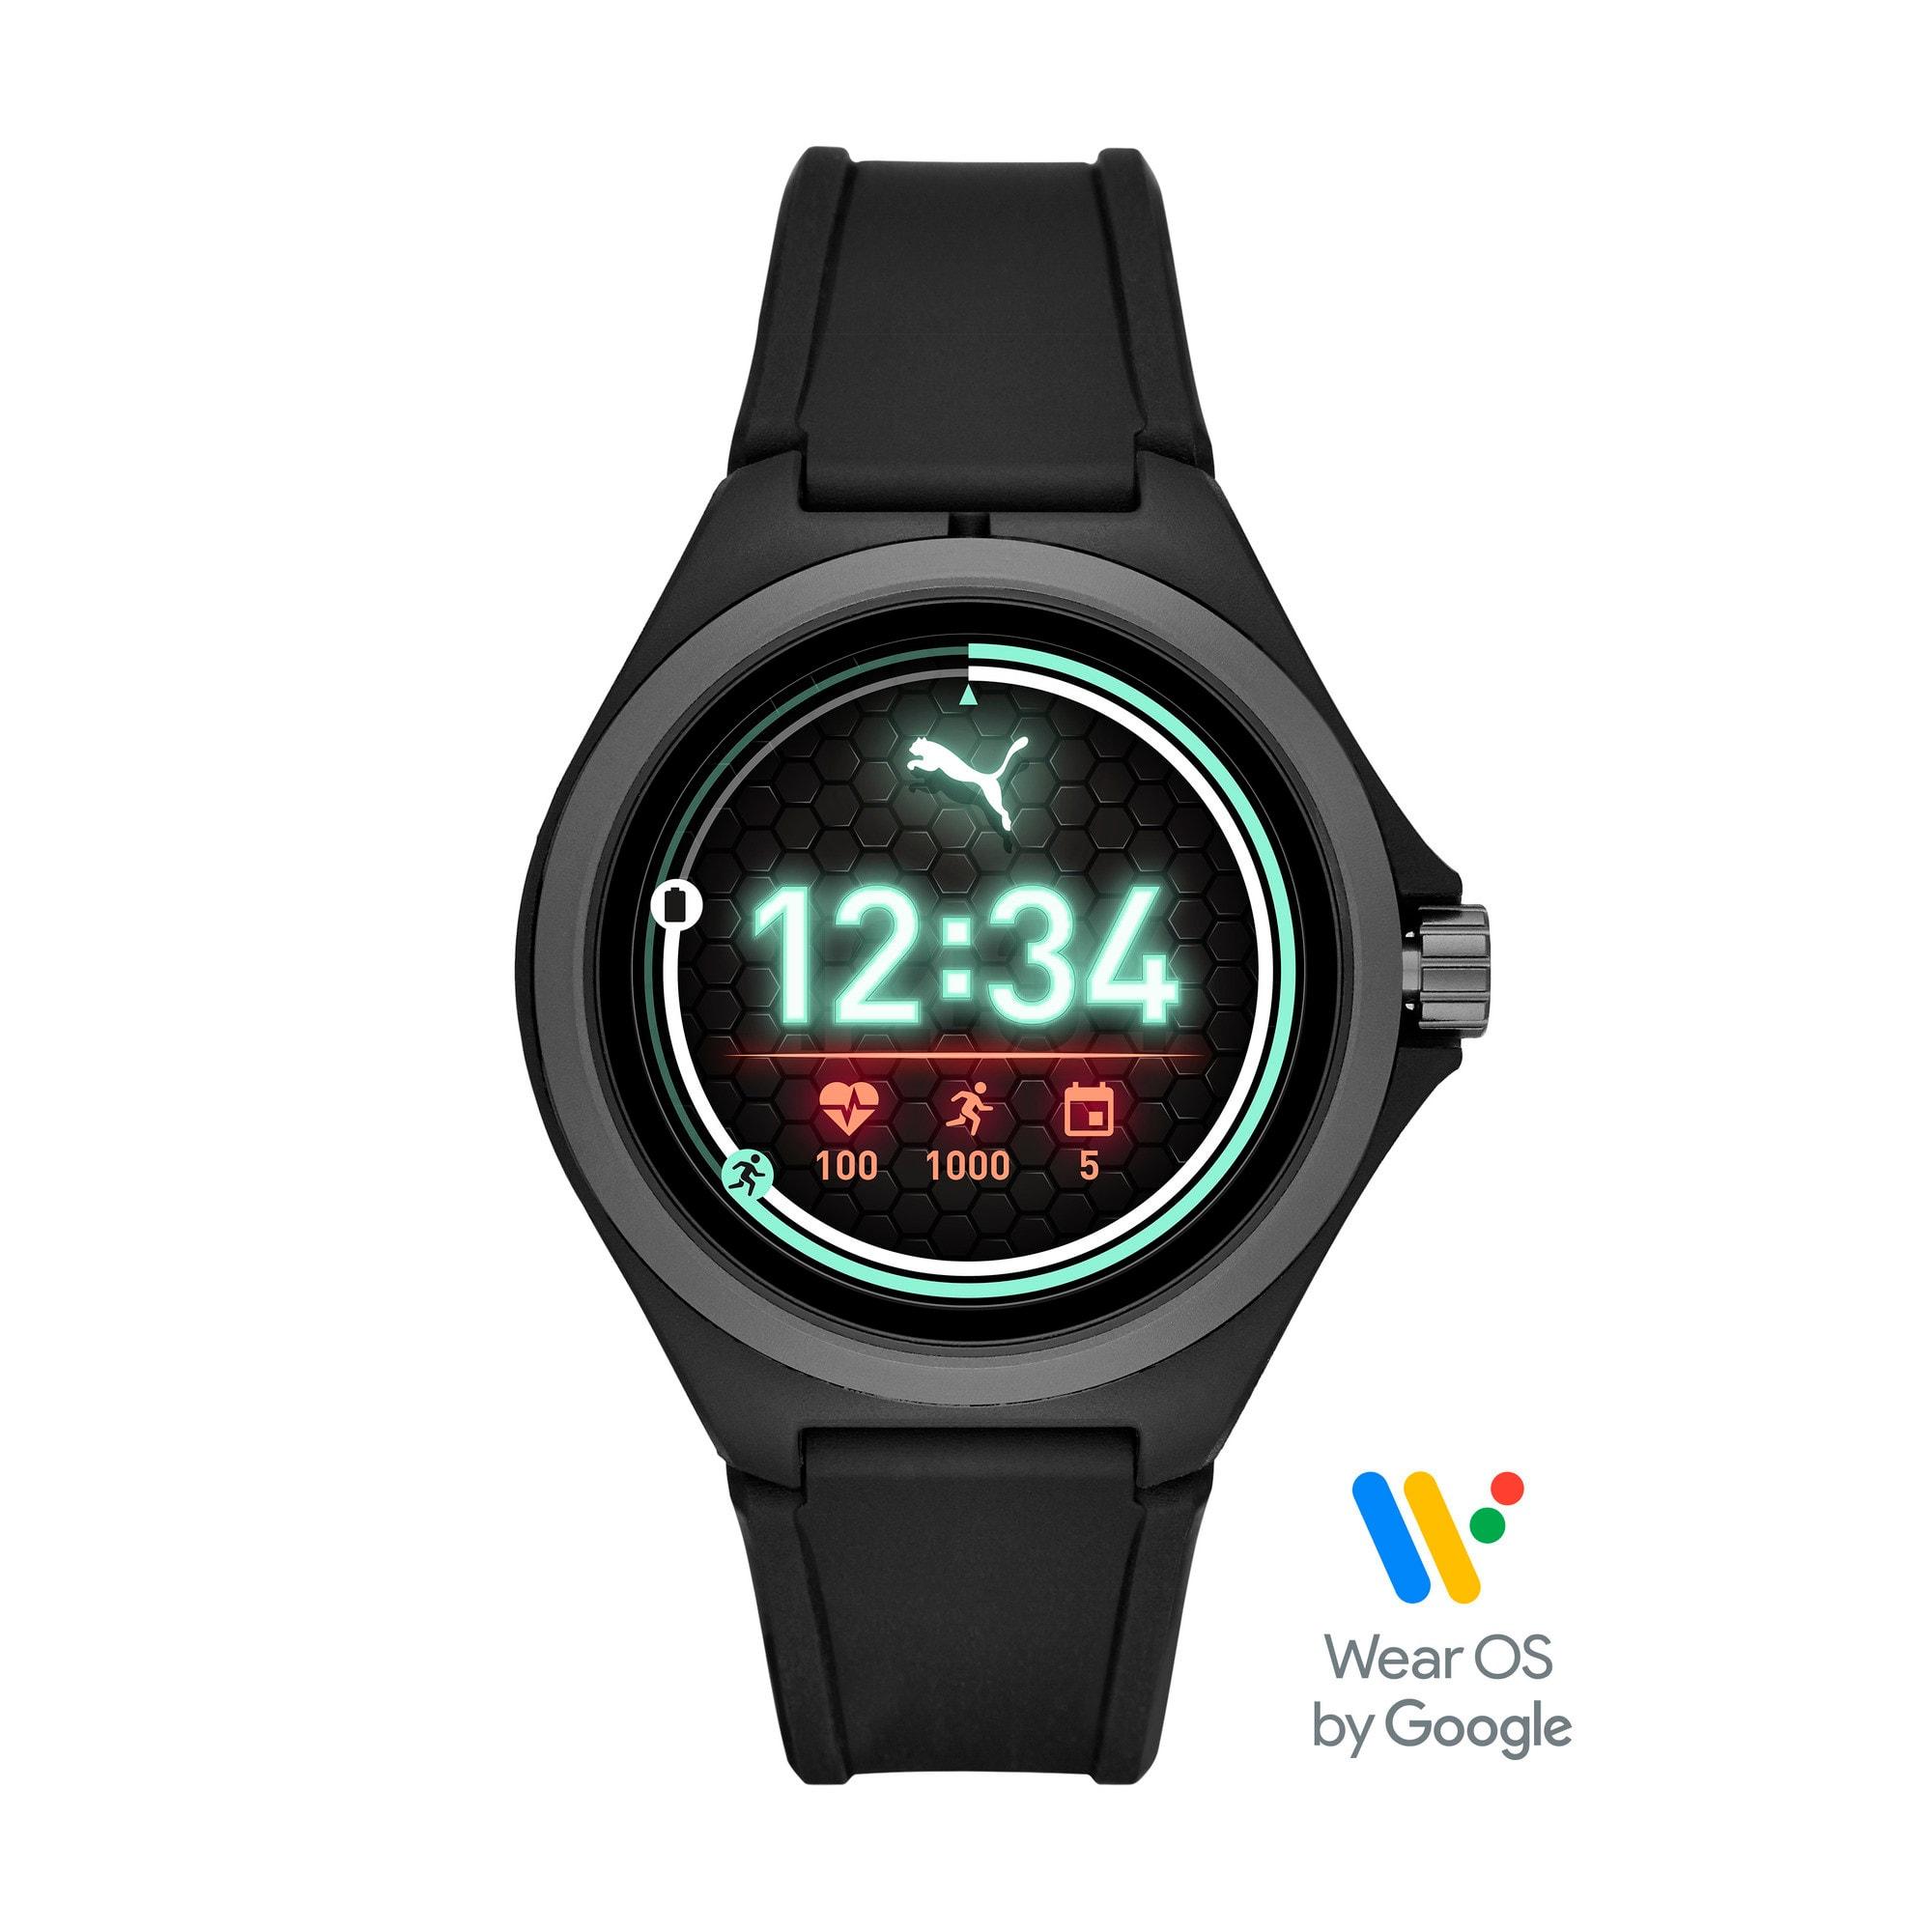 Thumbnail 1 of PUMA Smartwatch, Black/Gray, medium